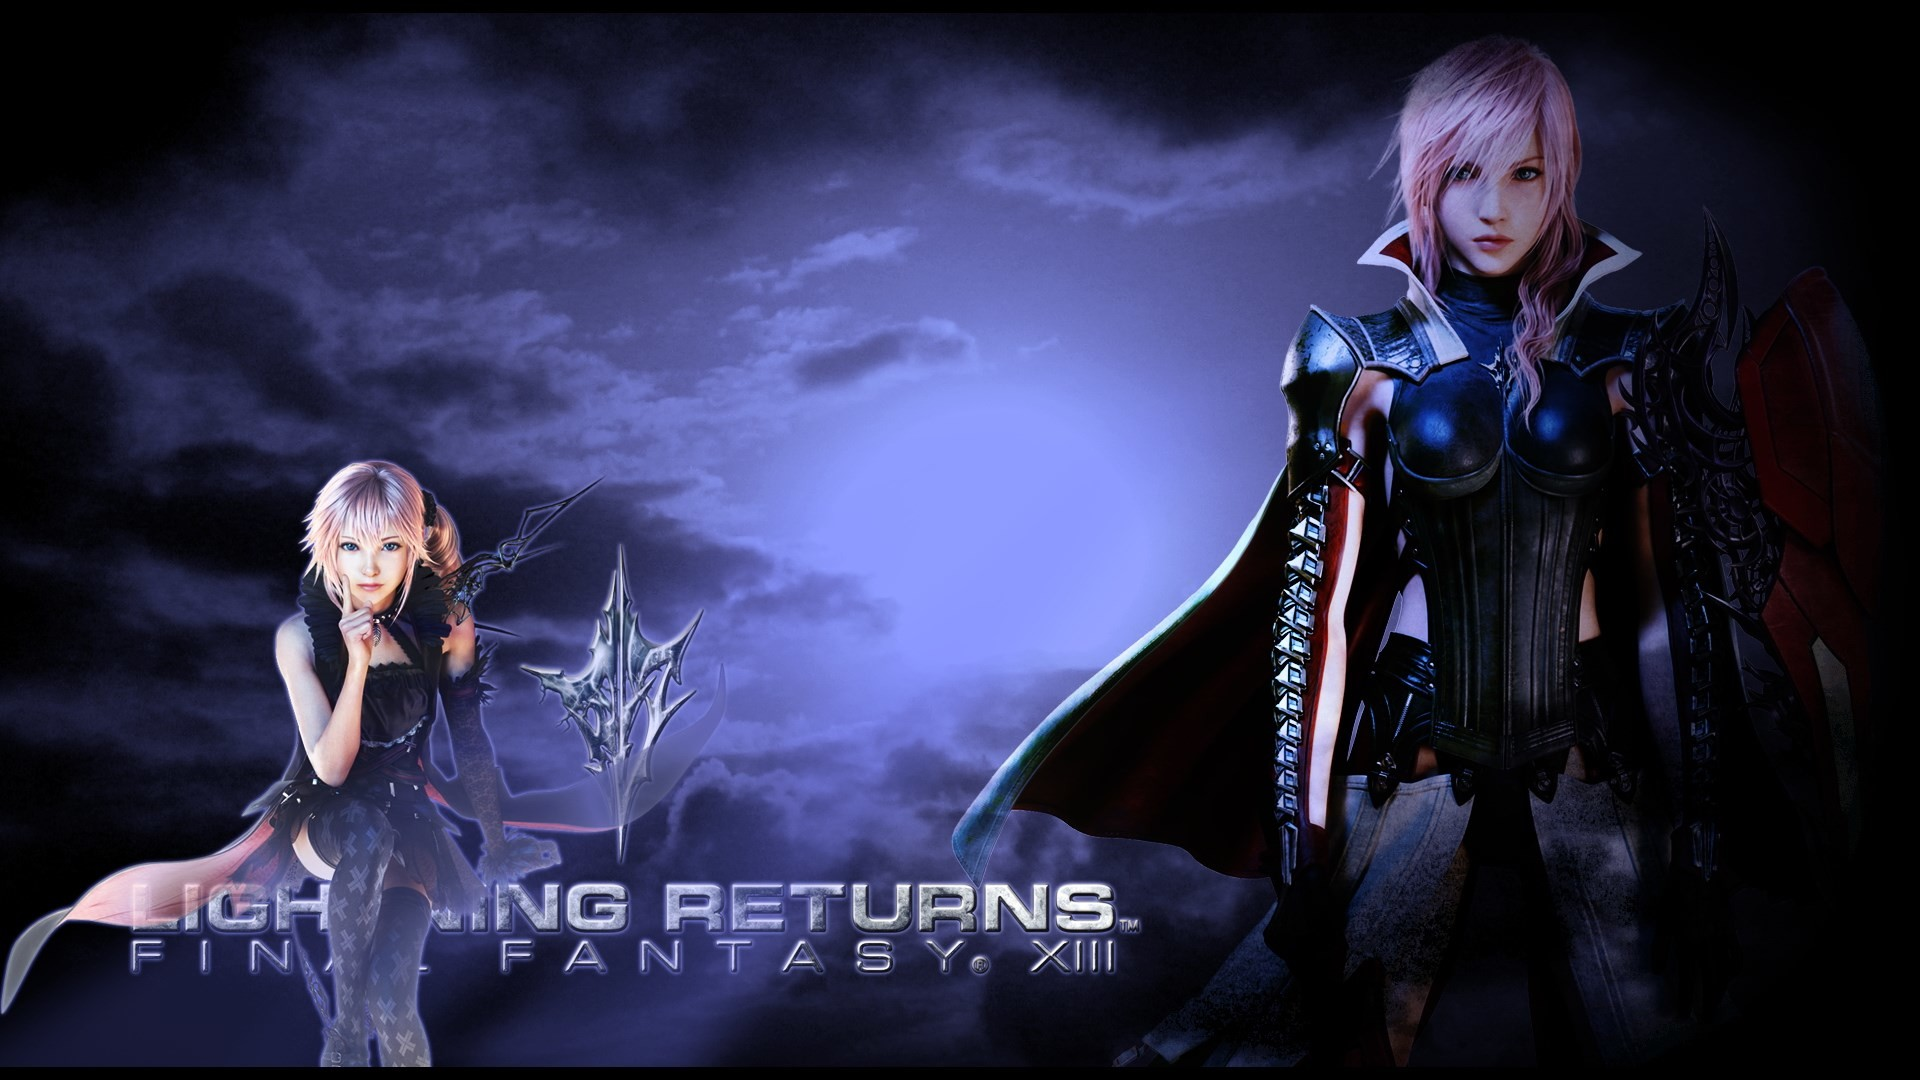 Pictures for Desktop: Final Fantasy XIII: Lightning Returns wallpaper –  Final Fantasy XIII: Lightning Returns category